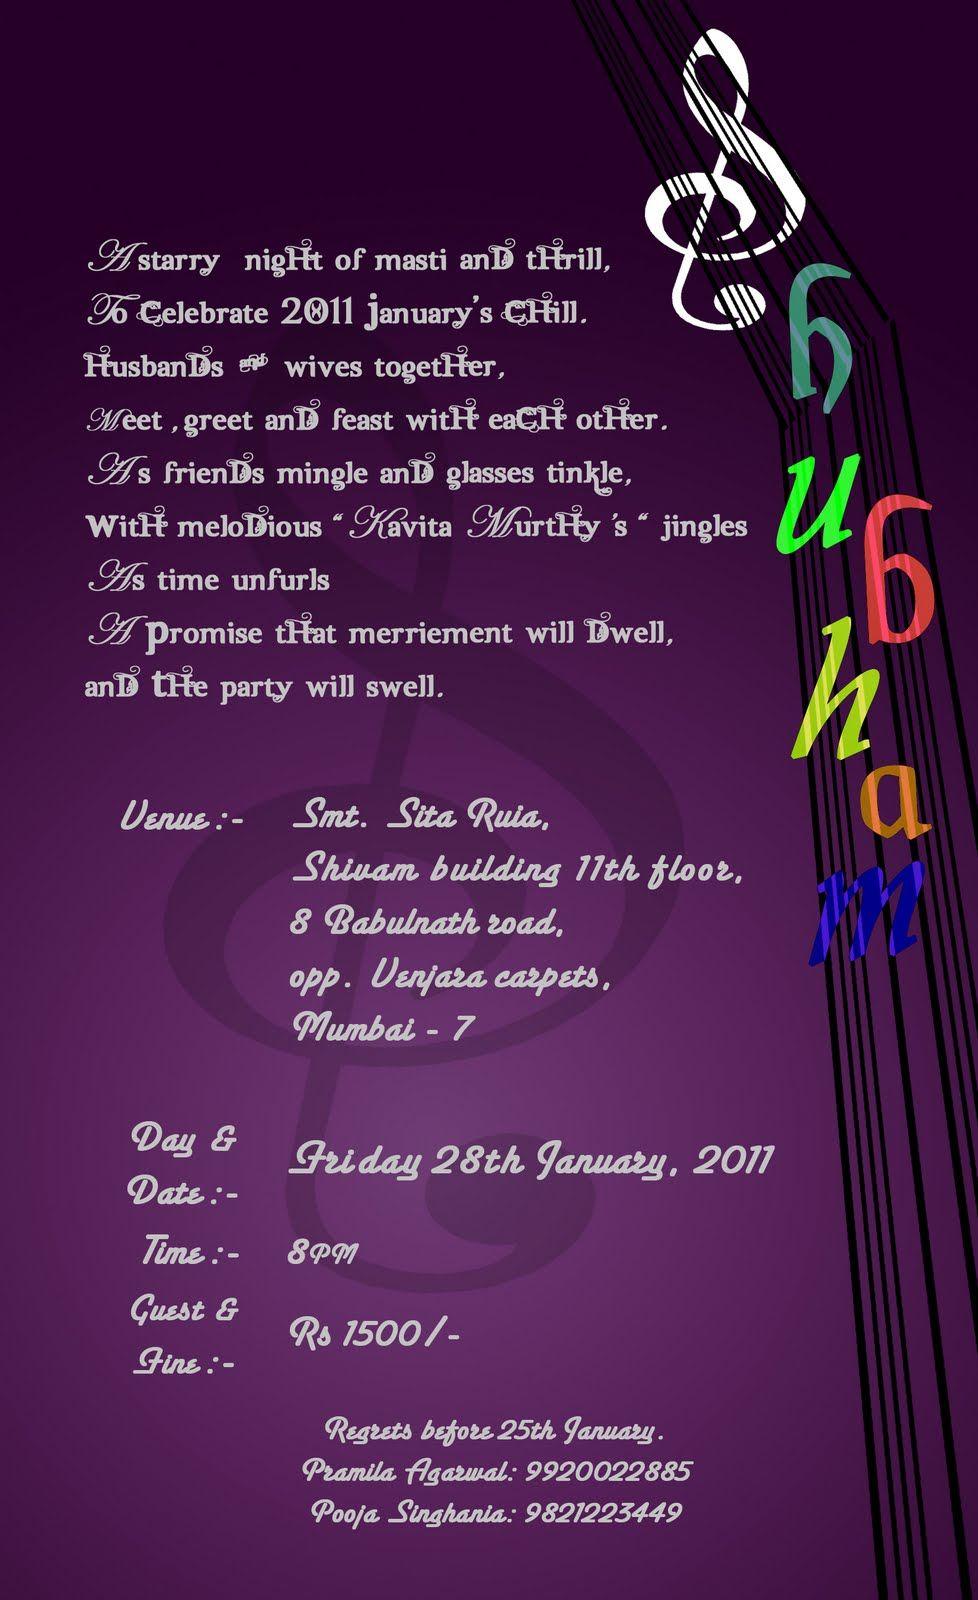 cool Free Printable Sweet 16 Birthday Invitations Get more ...